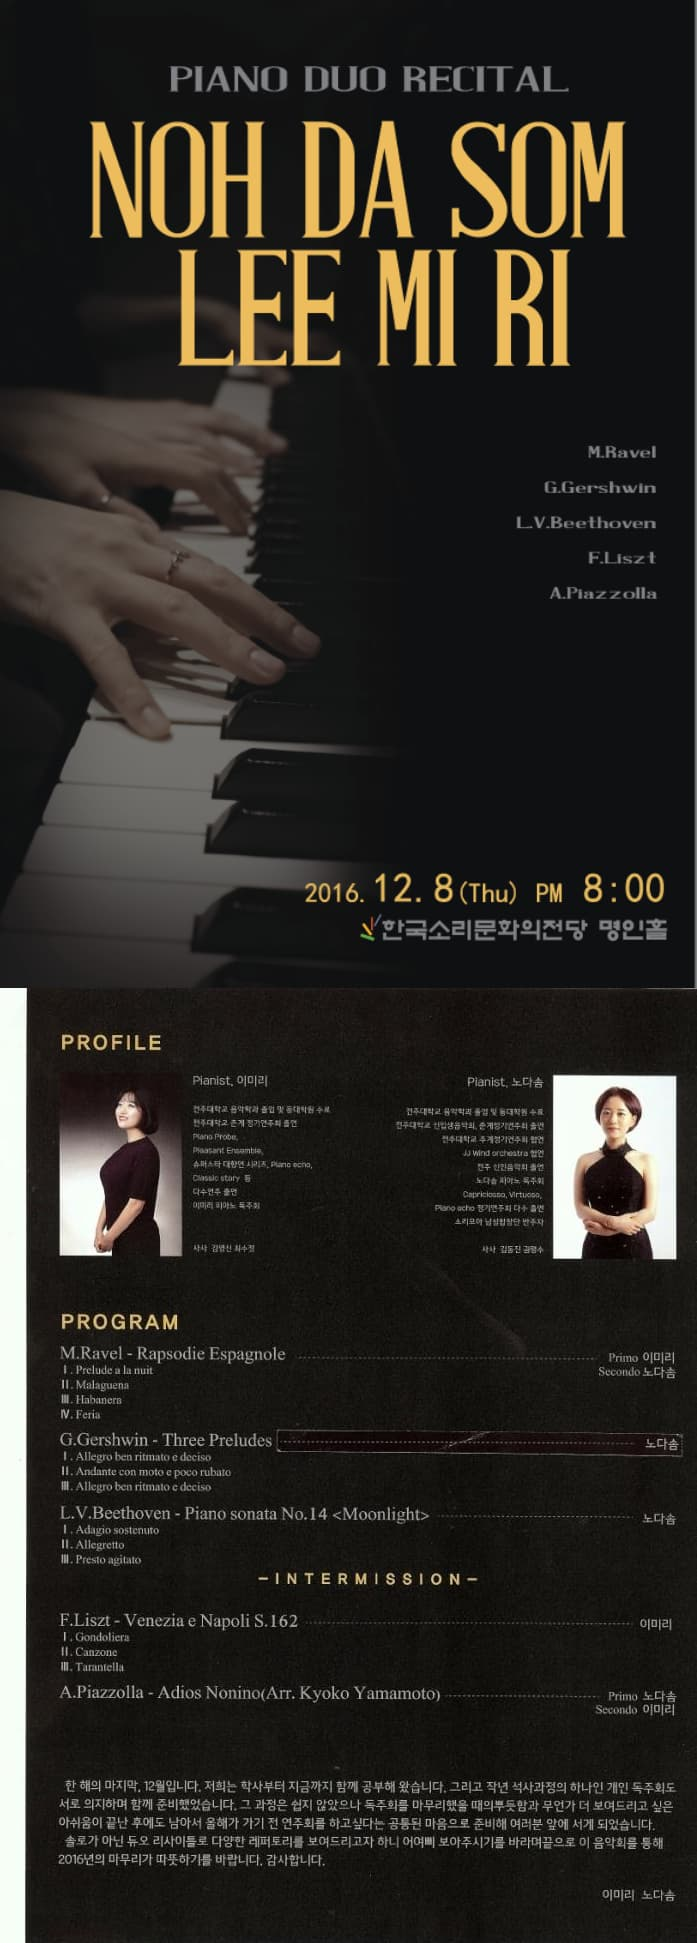 PIANO DUO RECITAL NOH DA SON LEE MI RI M.Ravel G.Gershwin L V .Beethoven F.Liszt A.Pfazzolla 2016. 12. 8 (Thu) pm 8 : 00 한국소리문화의전당 명인홀PROFILE Pianist 이미리 Pianist 노다솜 PROGRAM INERMISSION 한 해의 마지막. 12월입니다. 저희는 학사부터 지금까지 함꼐 공부해 왔습니다. 그리고 작년 석사과정의 하나인 개인 독주회도 서로 의지하며 함께 준비했습니다. 그 과정은 쉽지 않았으나 독주회를 하고 싶다는 공통된 마음으로 준비해 여러분 앞에 서게 되었습니다. 솔로가 아닌 듀오 리시아틀로 다양한 레파토리를 보여드리고자 하니 어여삐 보아주시기 바랍니다 끝으로 이 음악회를 통해 2016년의 마무리가 따뜻하기를 바랍니다. 가마합니다. 이미리 노다솜